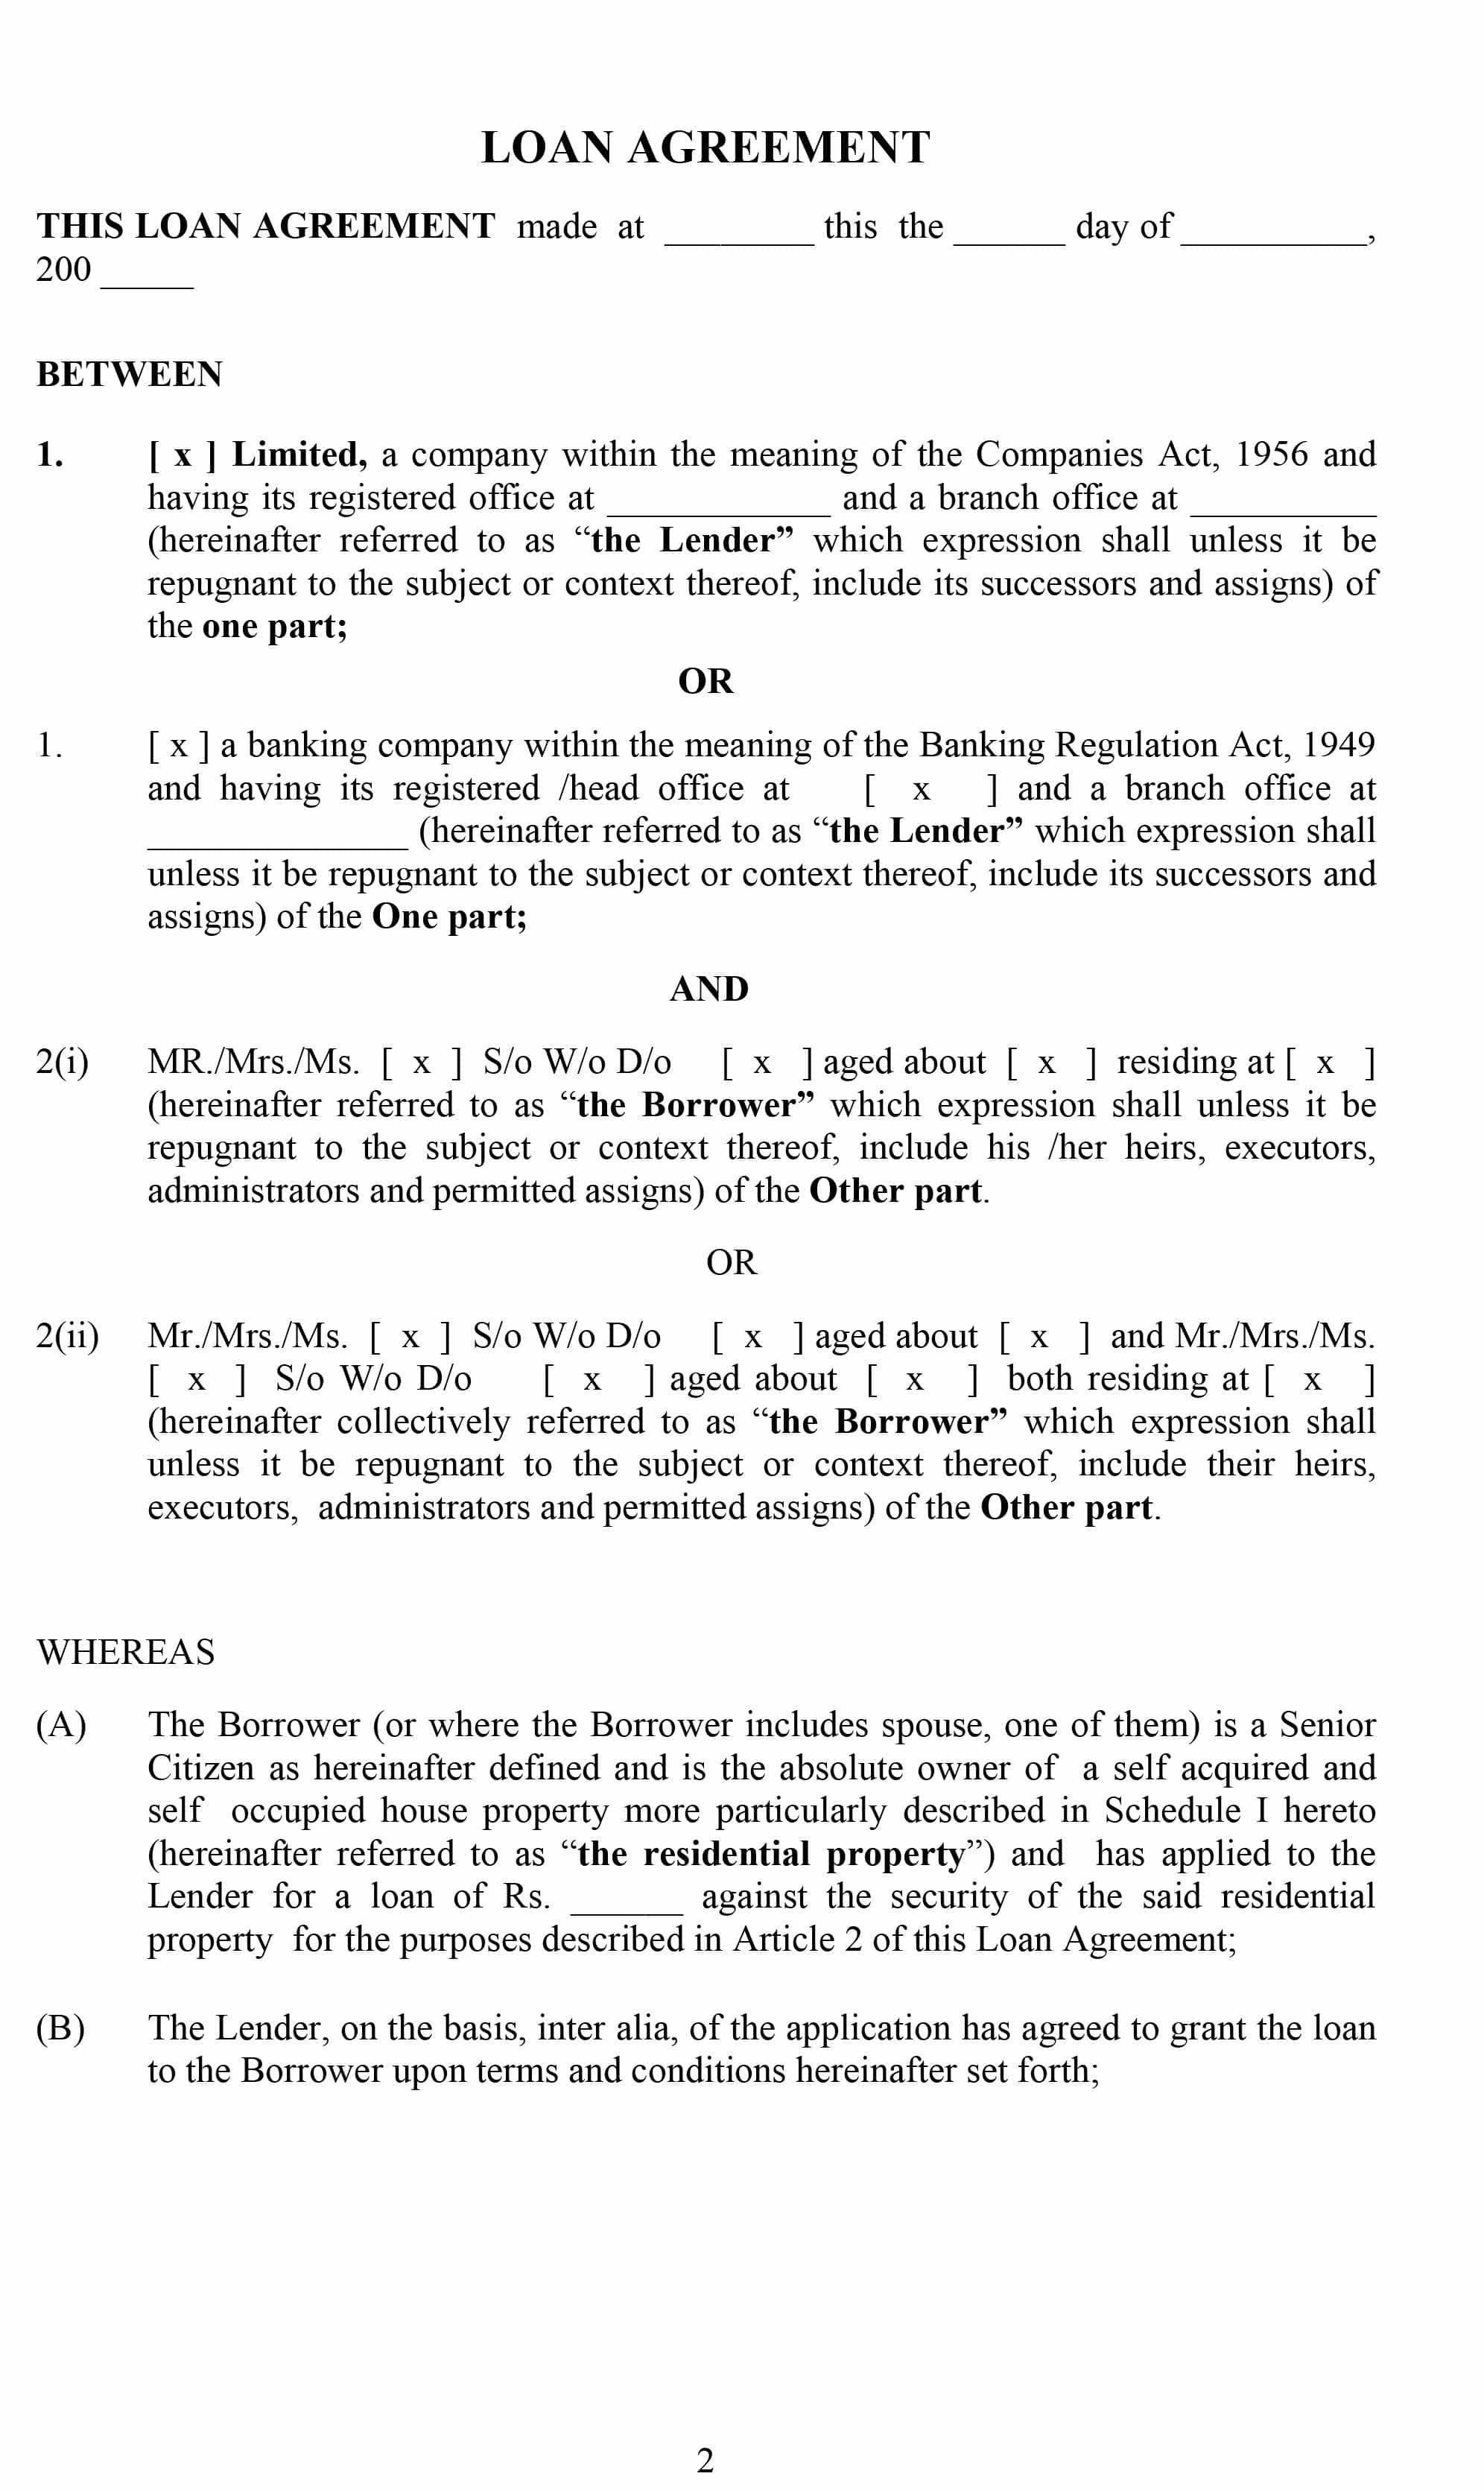 Free Loan Agreement Templates Word  Pdf ᐅ Template Lab In Cosigner Loan Agreement Template